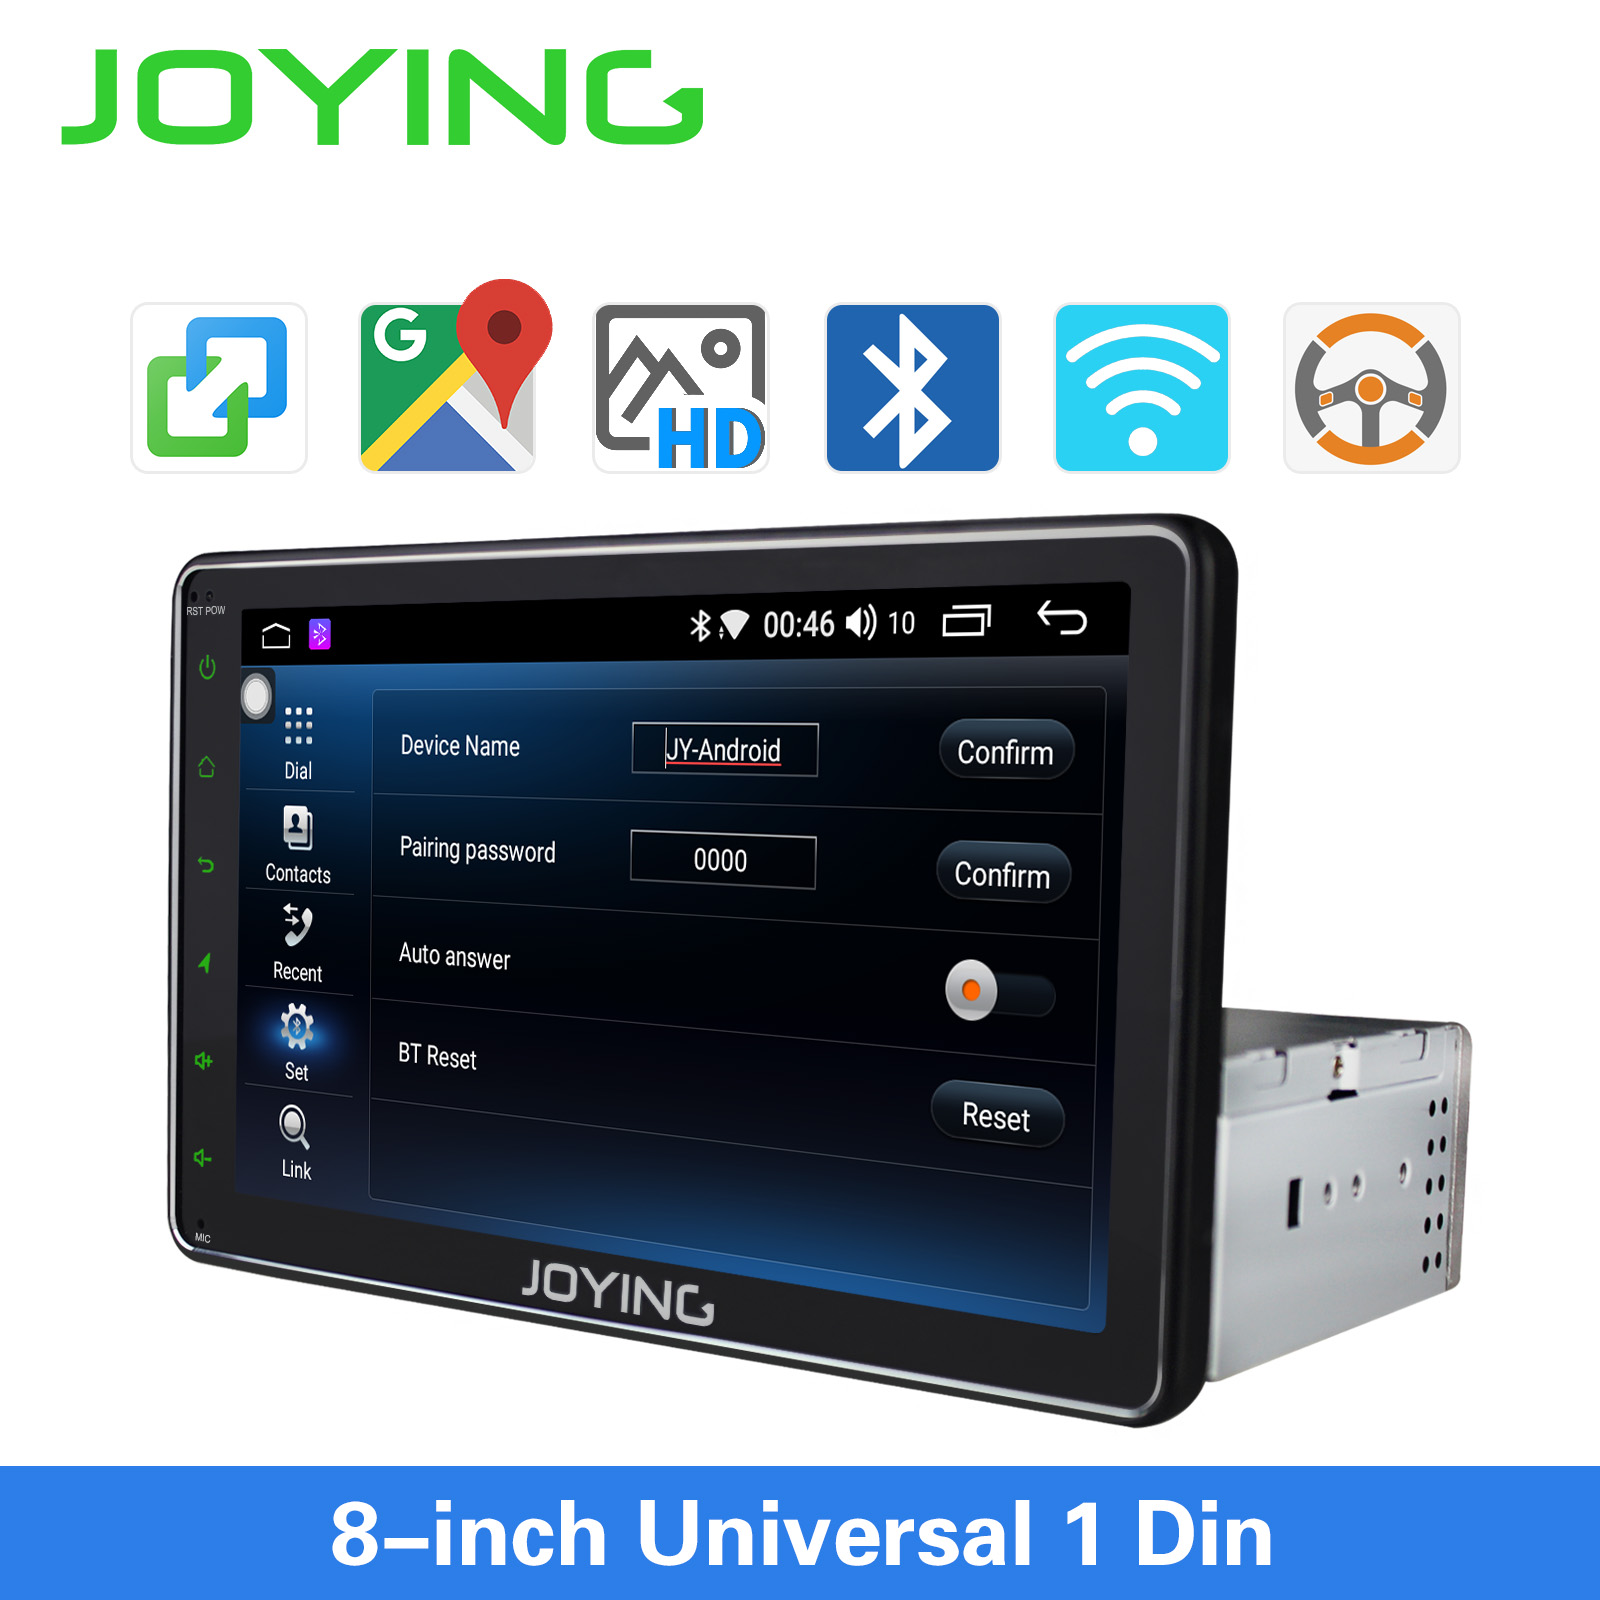 Image 3 - JOYING single din universal car radio 8 inch IPS screen autoradio head unit GPS suport mirror link& fast boot&s*back up cameraCar Multimedia Player   -